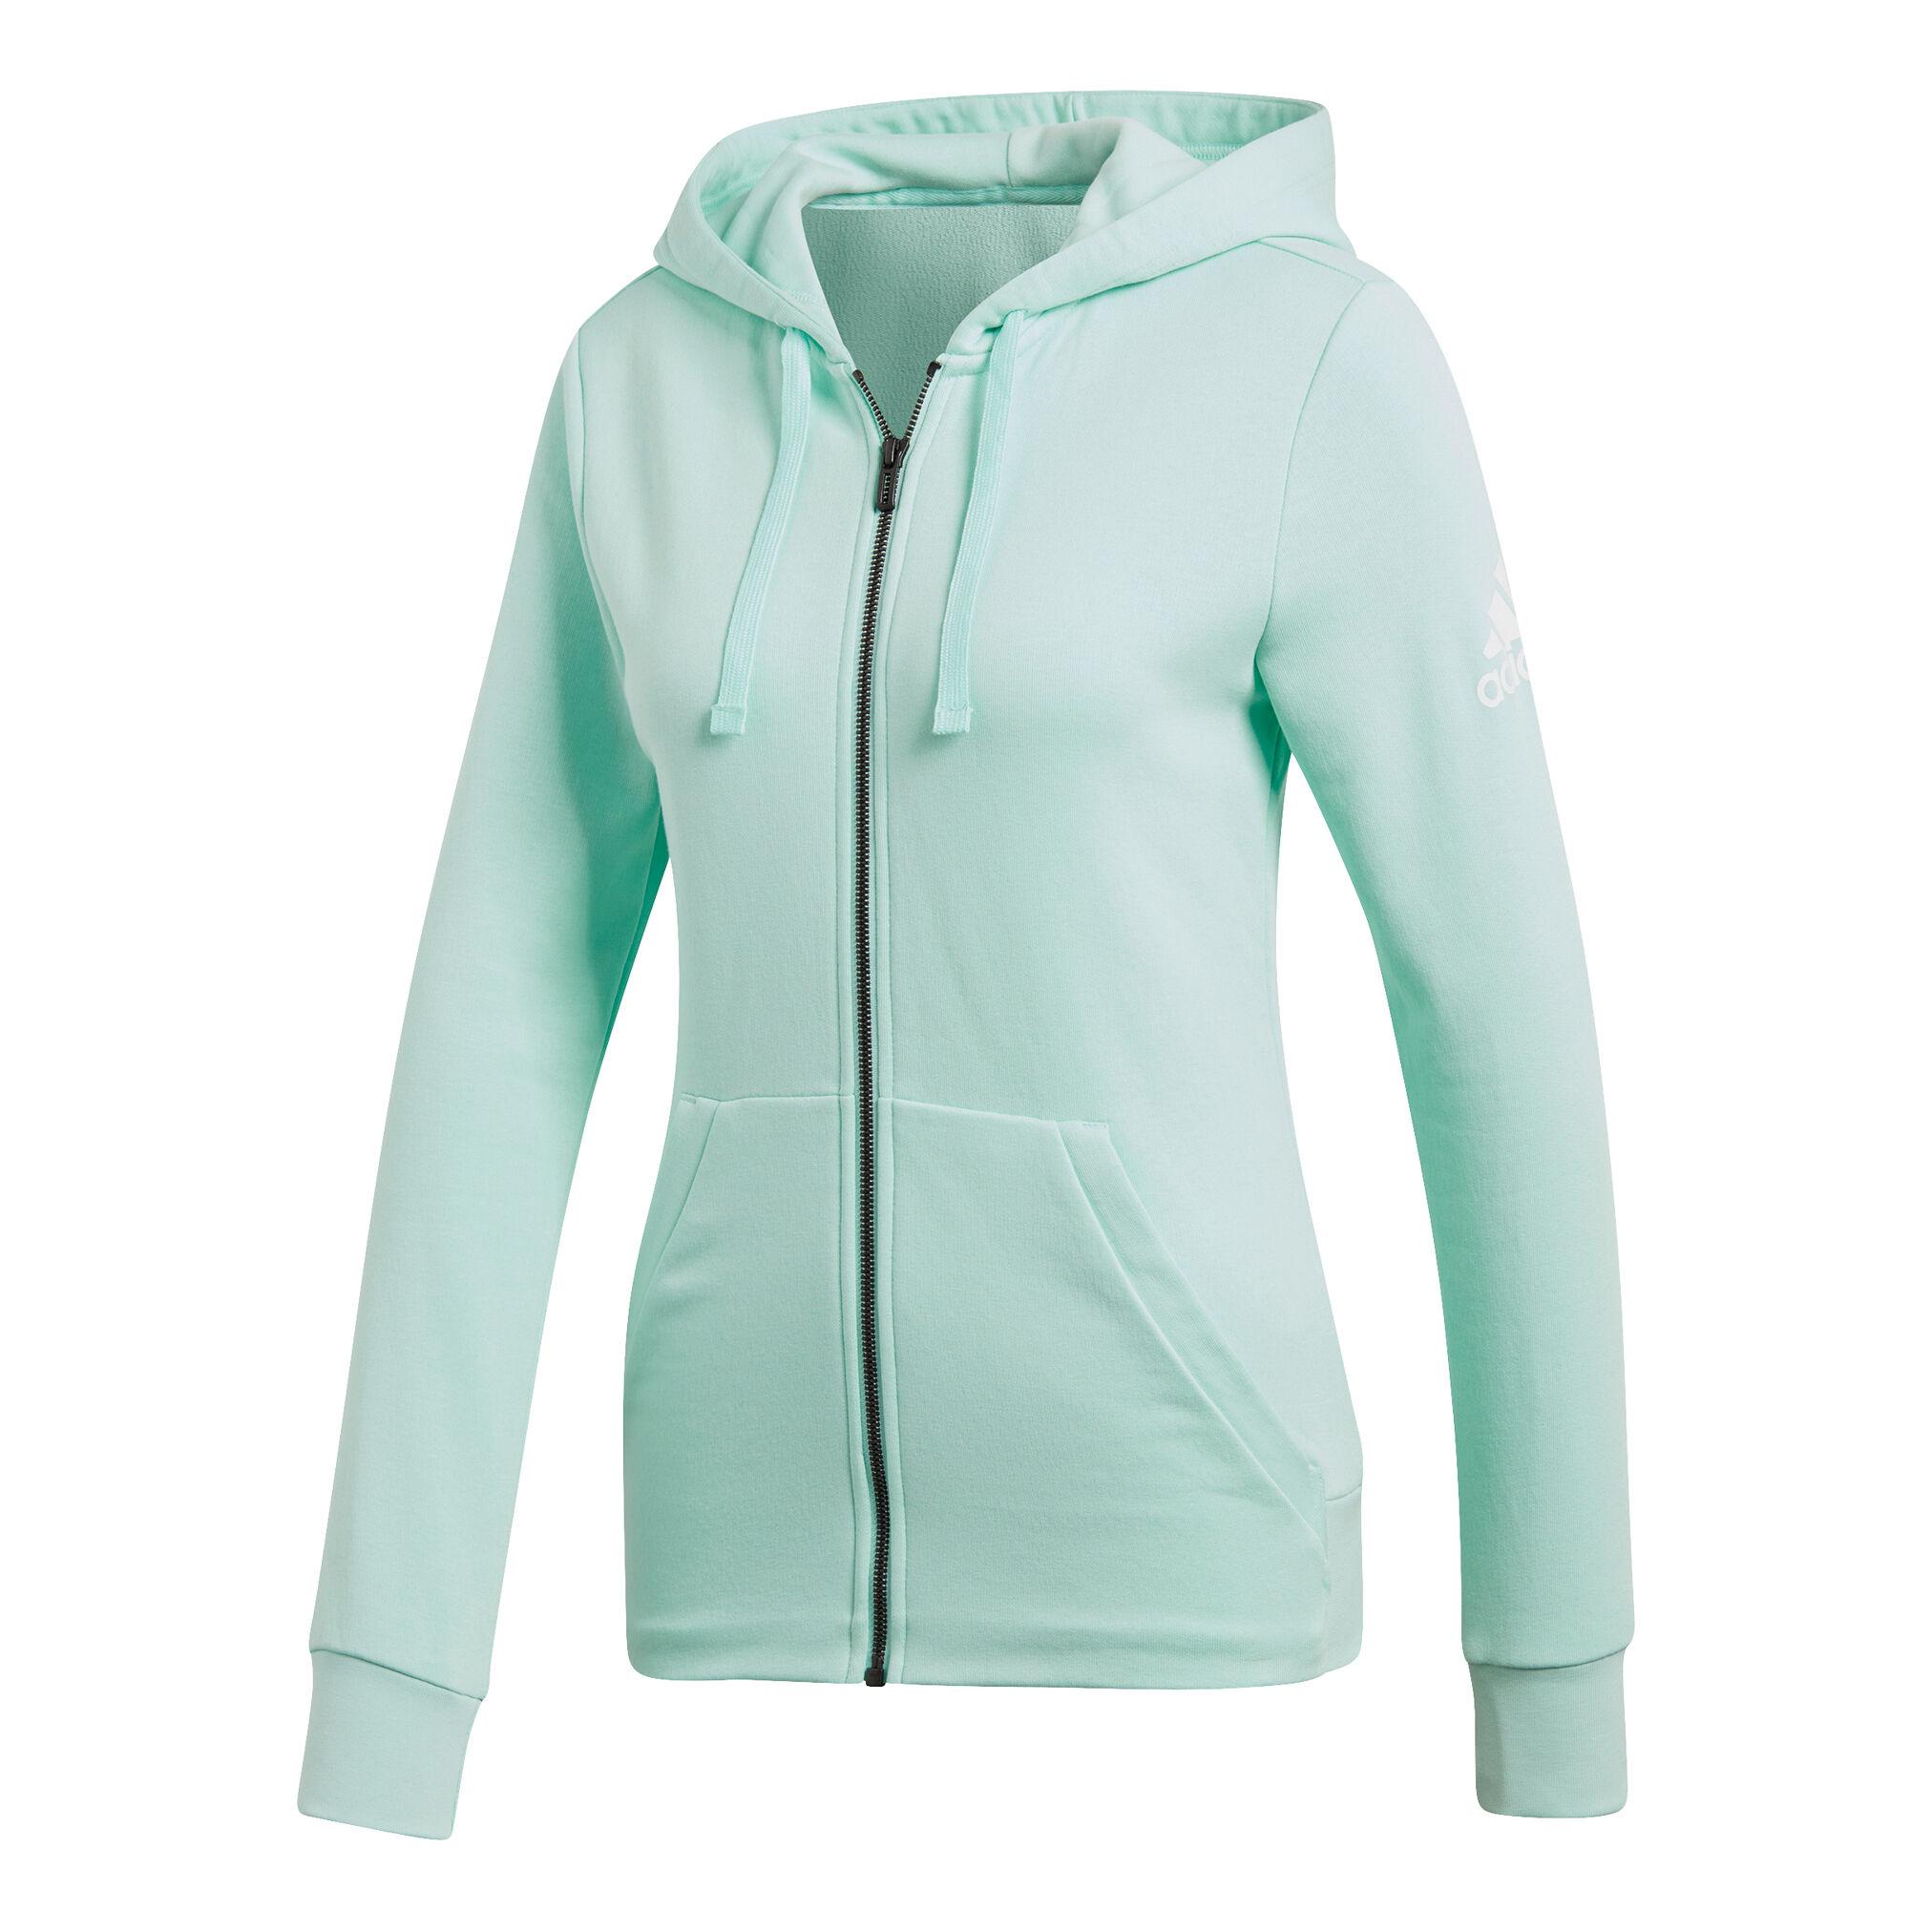 Adidas Solid Kapuzenjacke ab 48,61 € | Preisvergleich bei